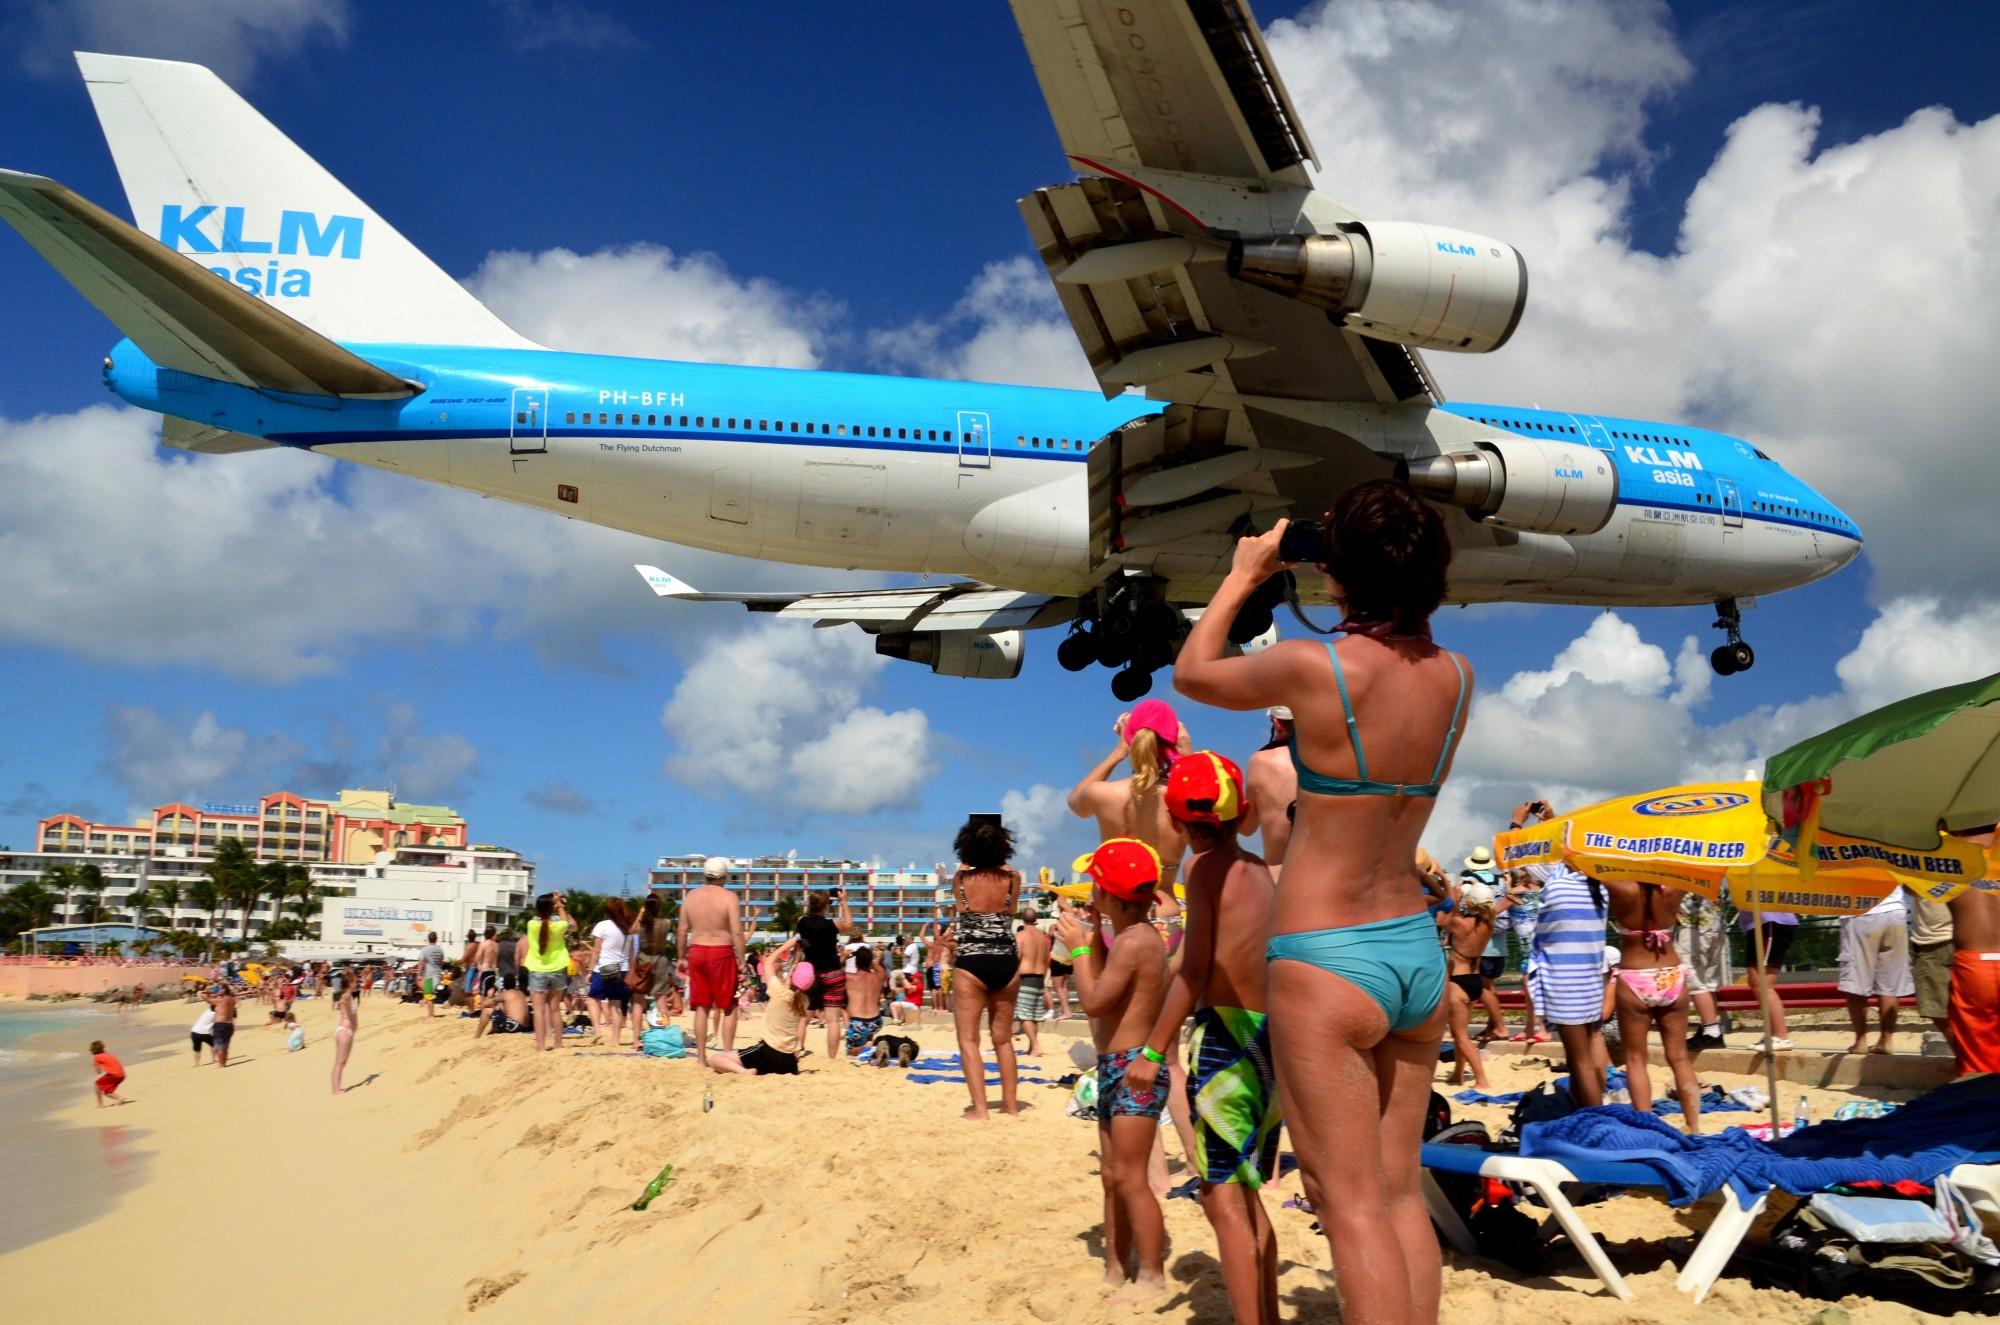 Saint Barthelemy, in spiaggia mentre atterra l'aereo